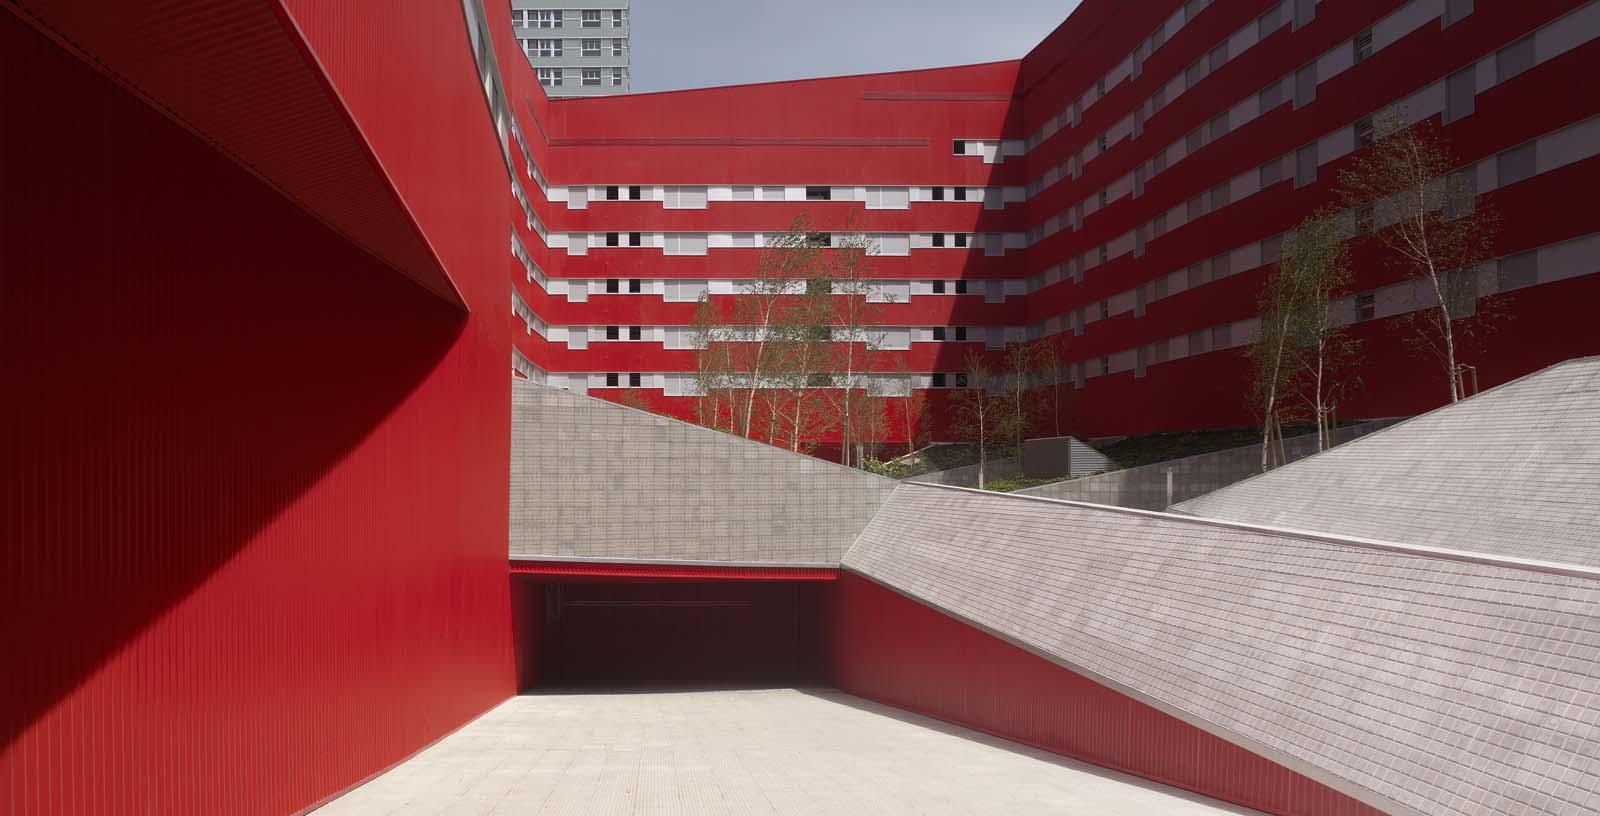 242_Salburua_Social_Housing_003_Architecture_IDOM_coyright_Aitor_Ortiz